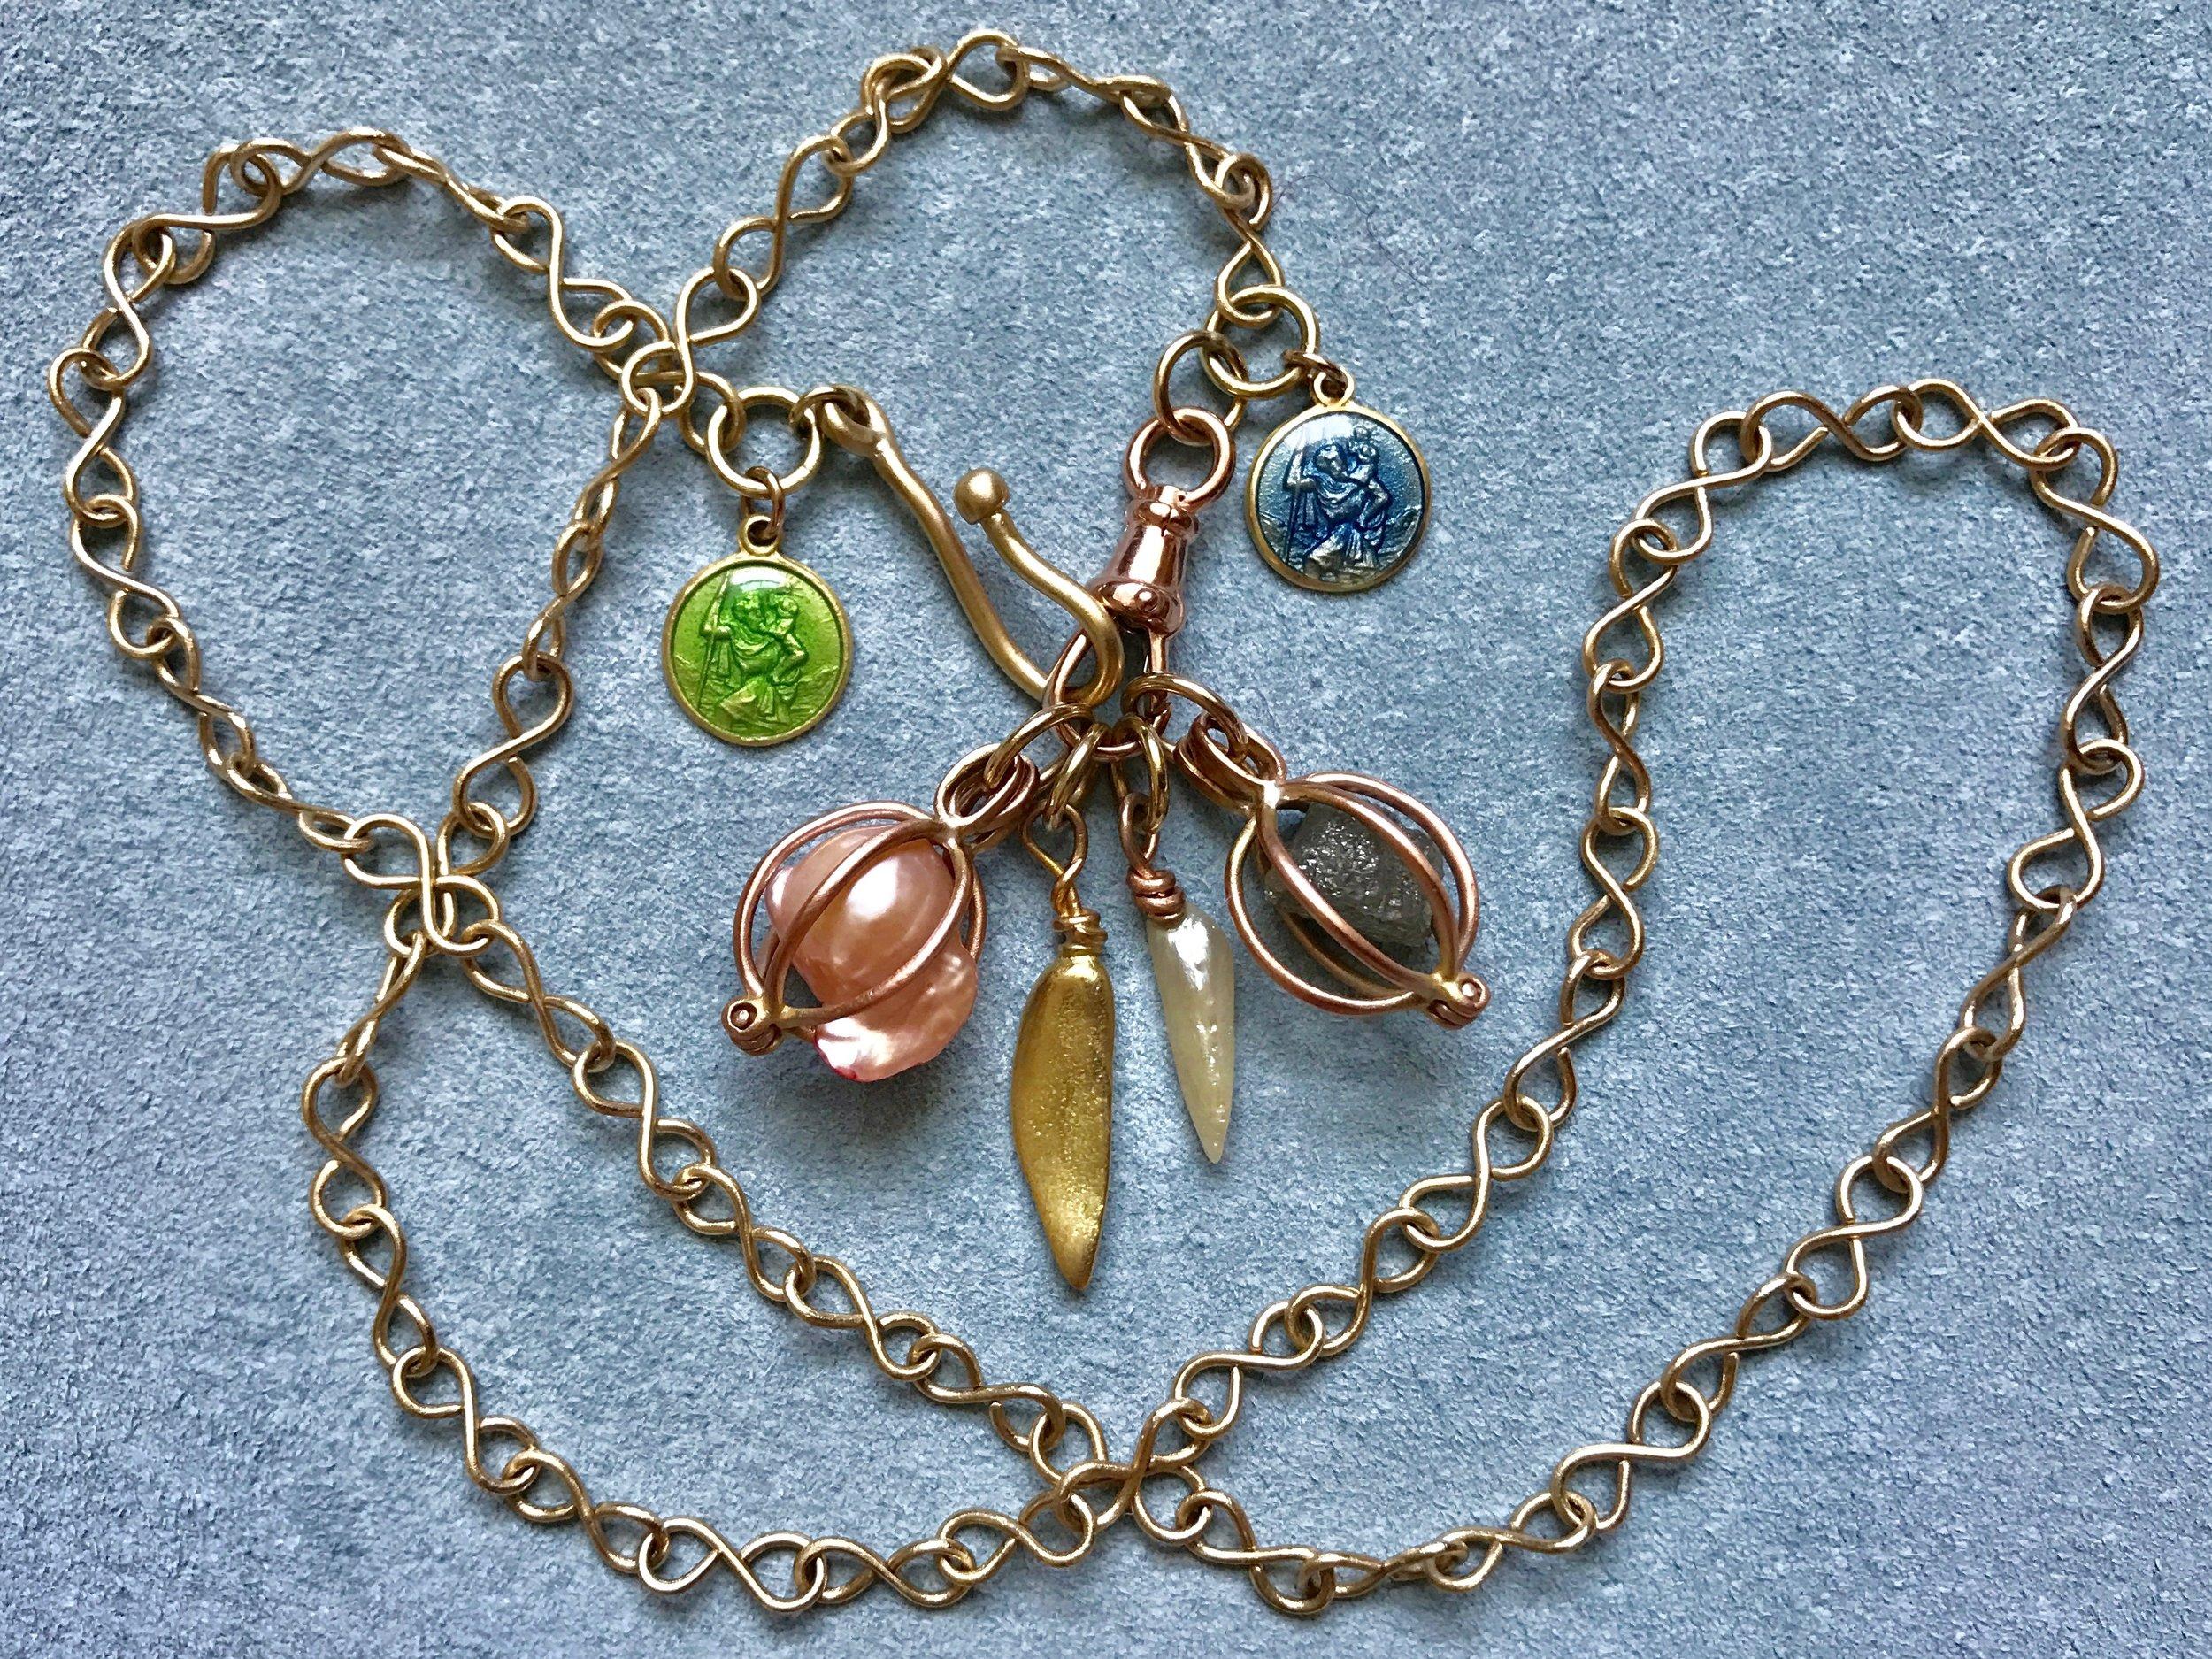 Co-Creation Infinity Chain, pearl basket, St Christopher's Mississippi's, Tara Turner Fine Jewellery.jpg